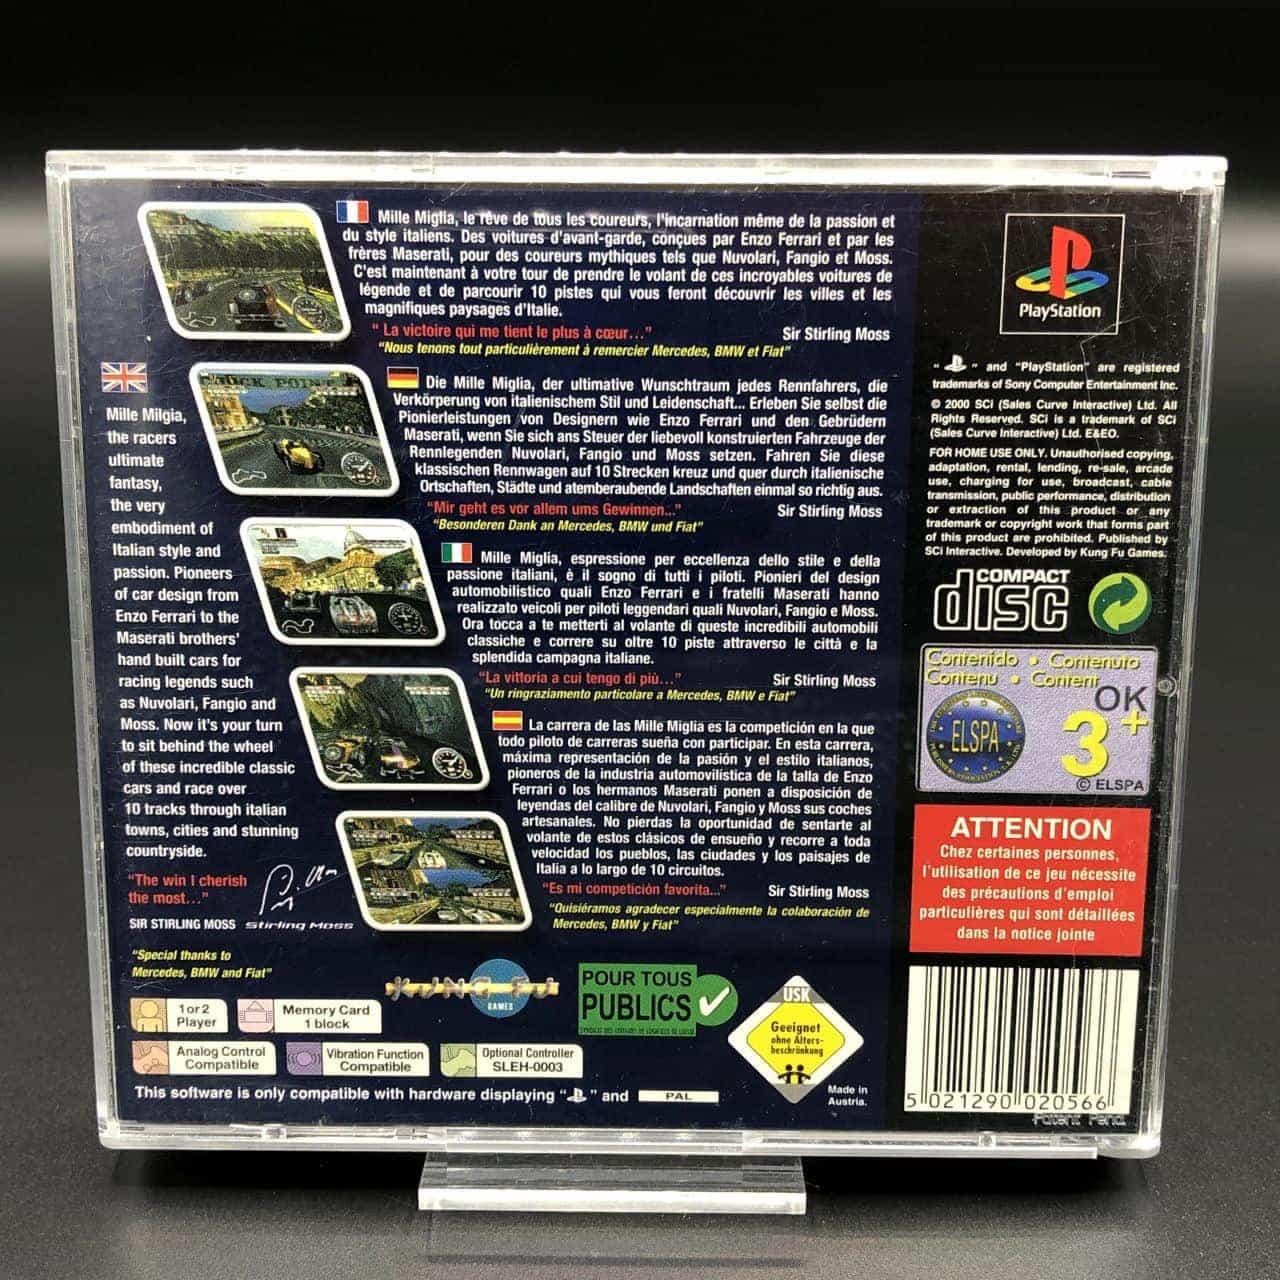 PS1 Mille Miglia (Komplett) (Sehr gut) Sony PlayStation 1